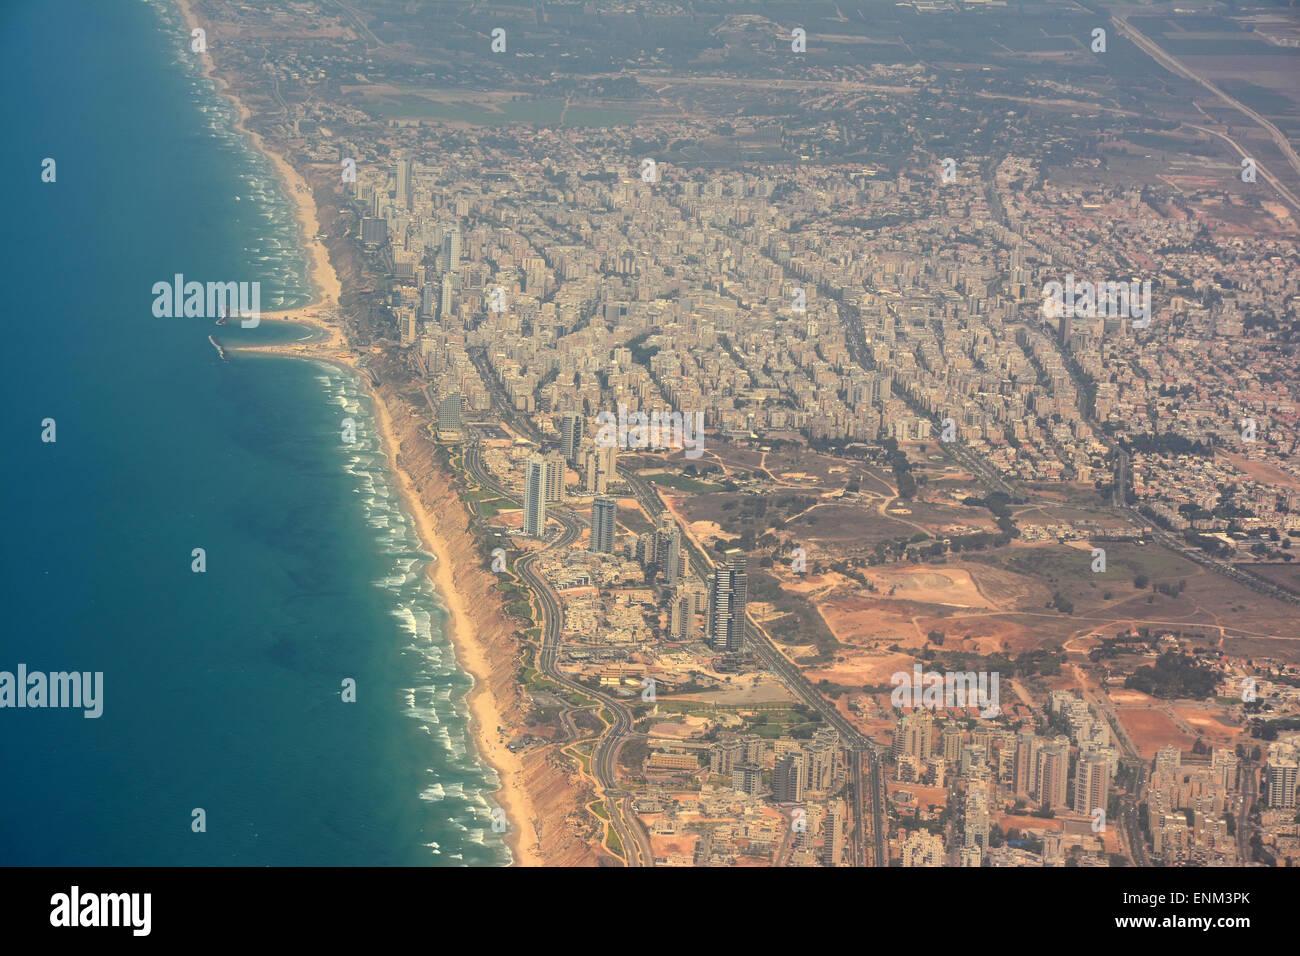 Netanya aerial  view, Israel - Stock Image